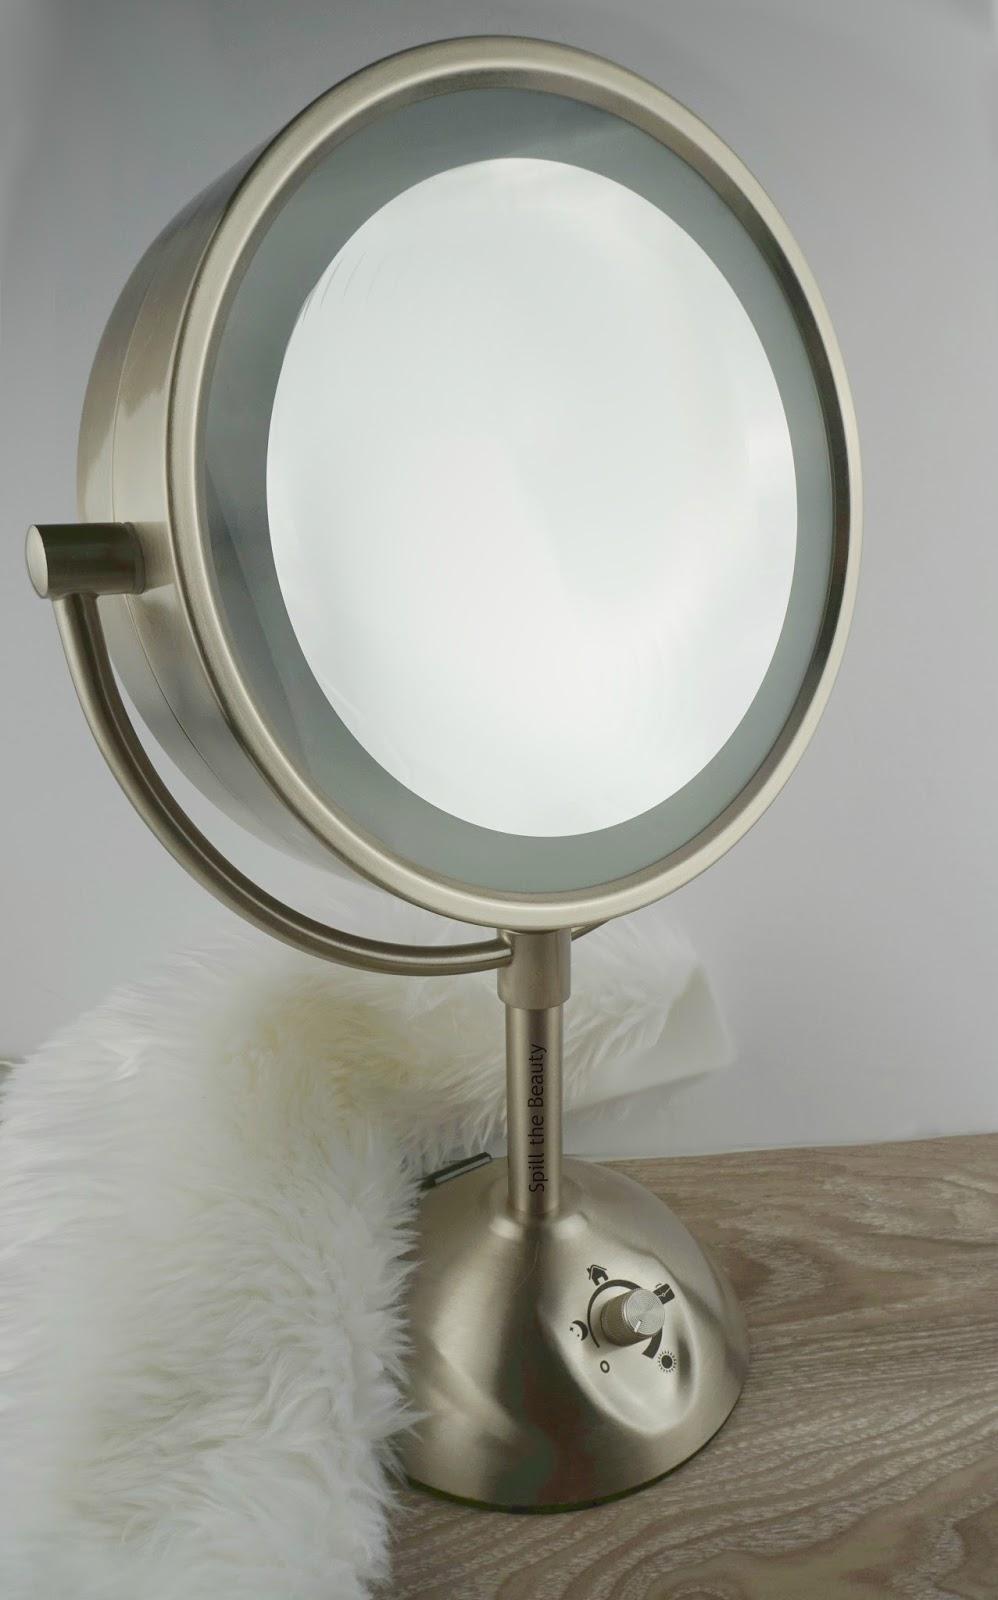 Conair True Glow Magnifying Mirror